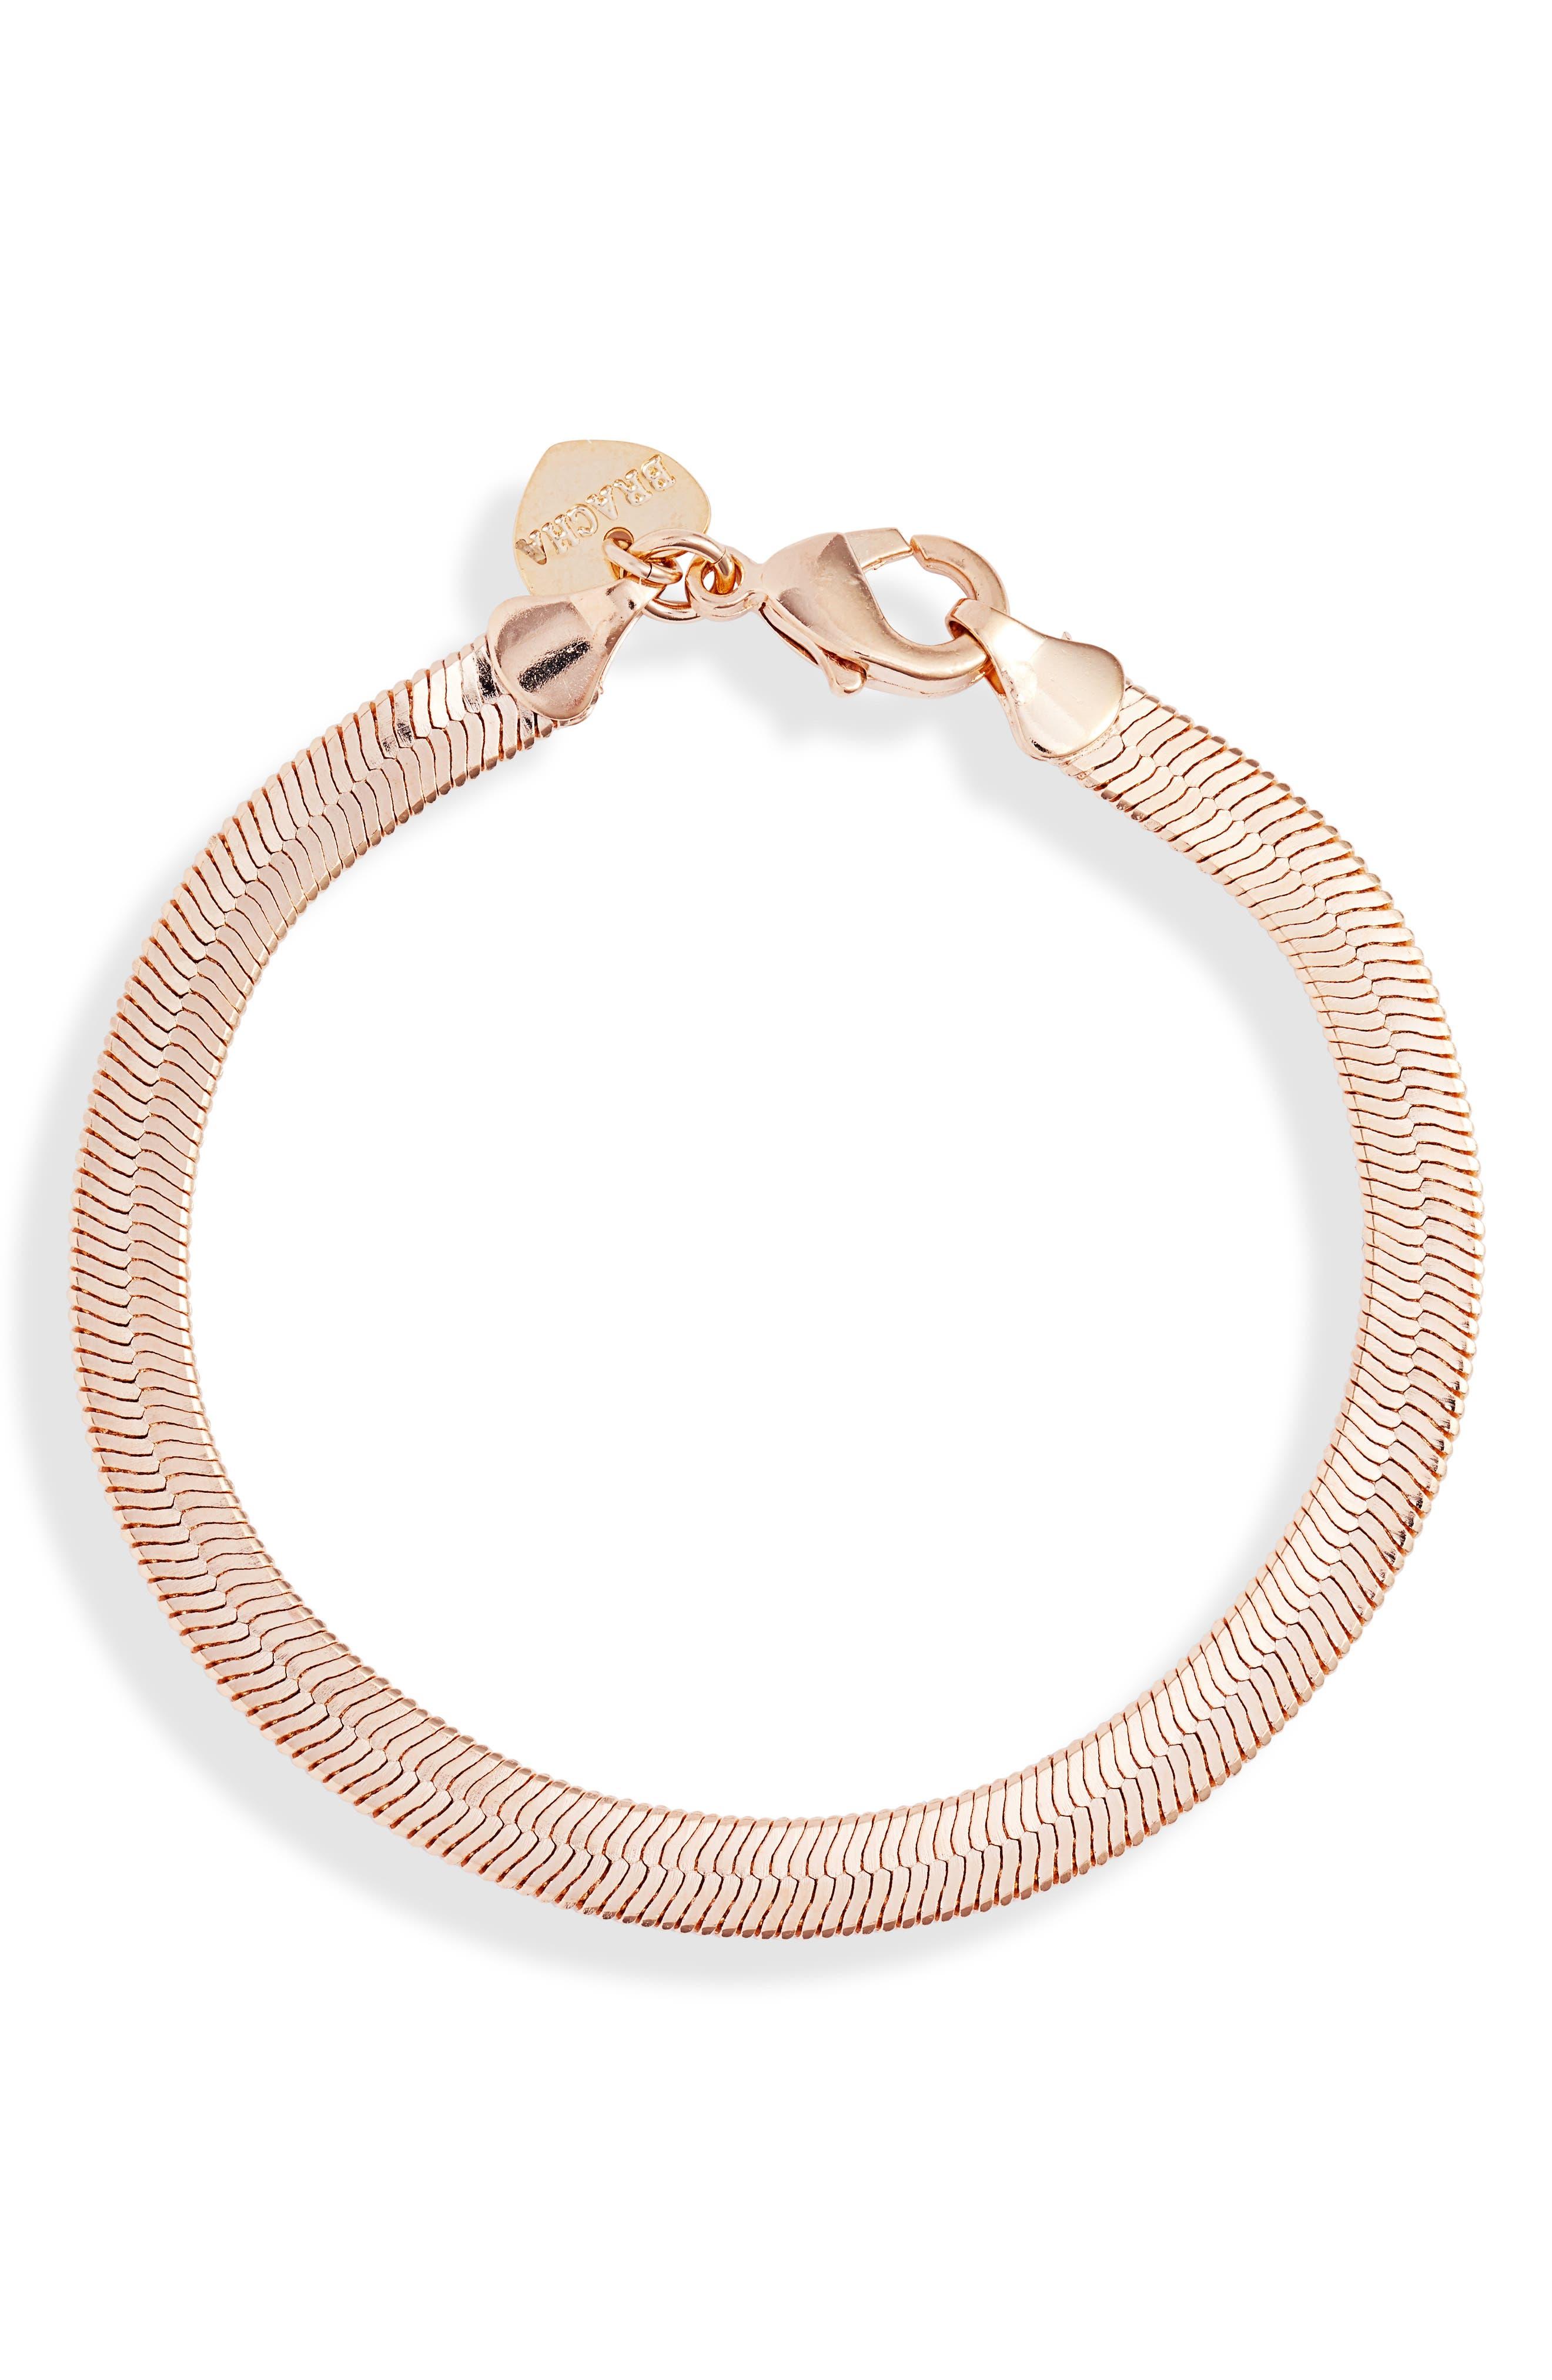 Monte Carlo Chain Bracelet